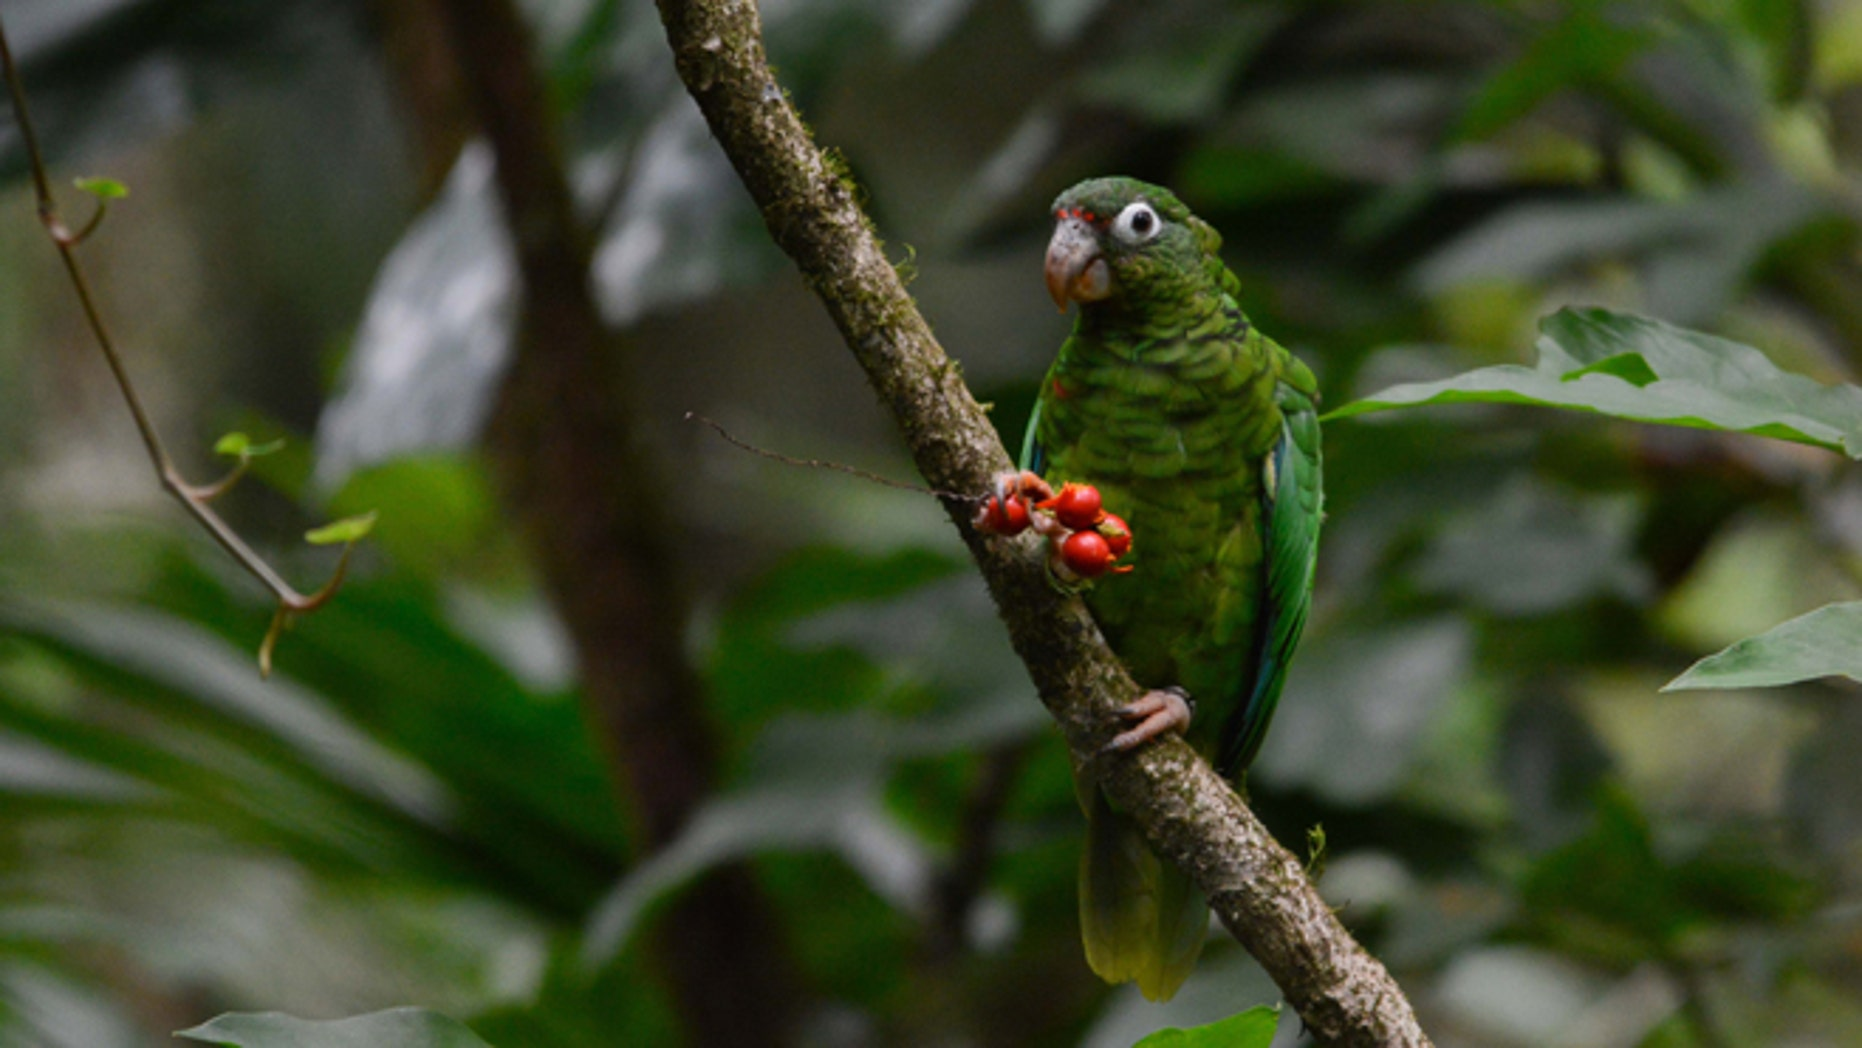 Breeding endangered Puerto Rican parrot near the Rio Abajo Nature Preserve, in Puerto Rico.